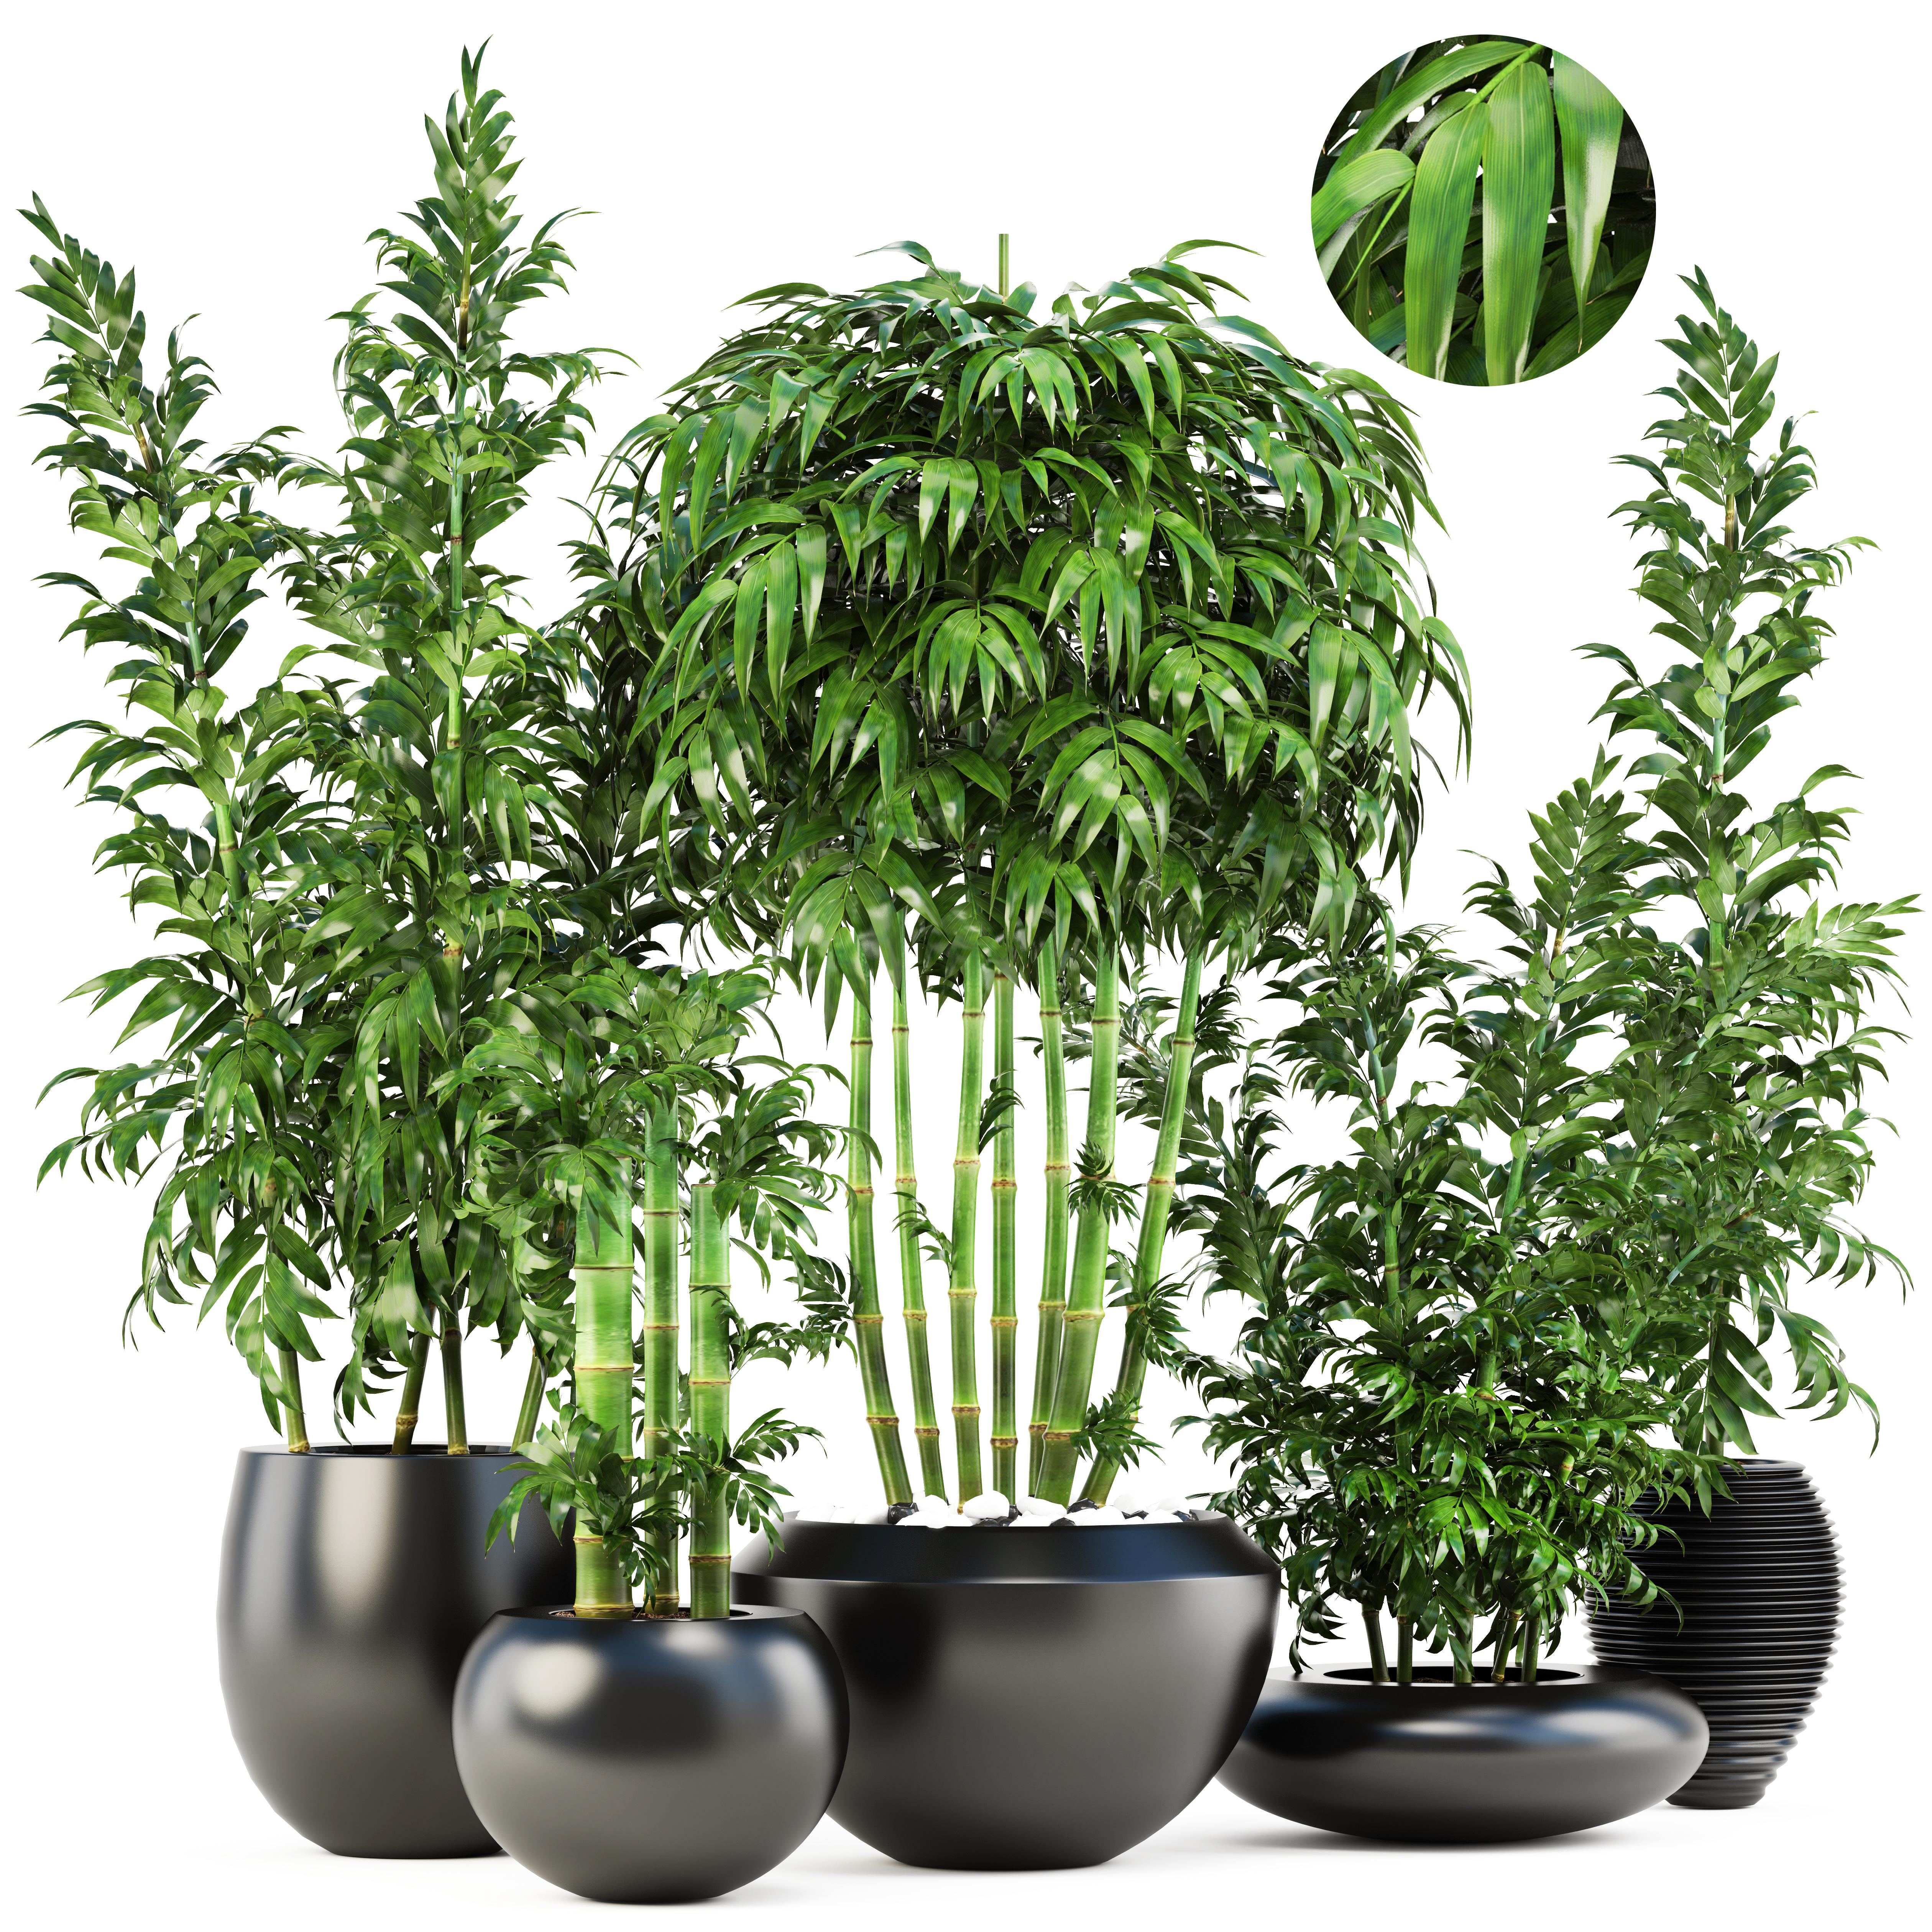 3d Bamboo Trees Model Turbosquid 1228393